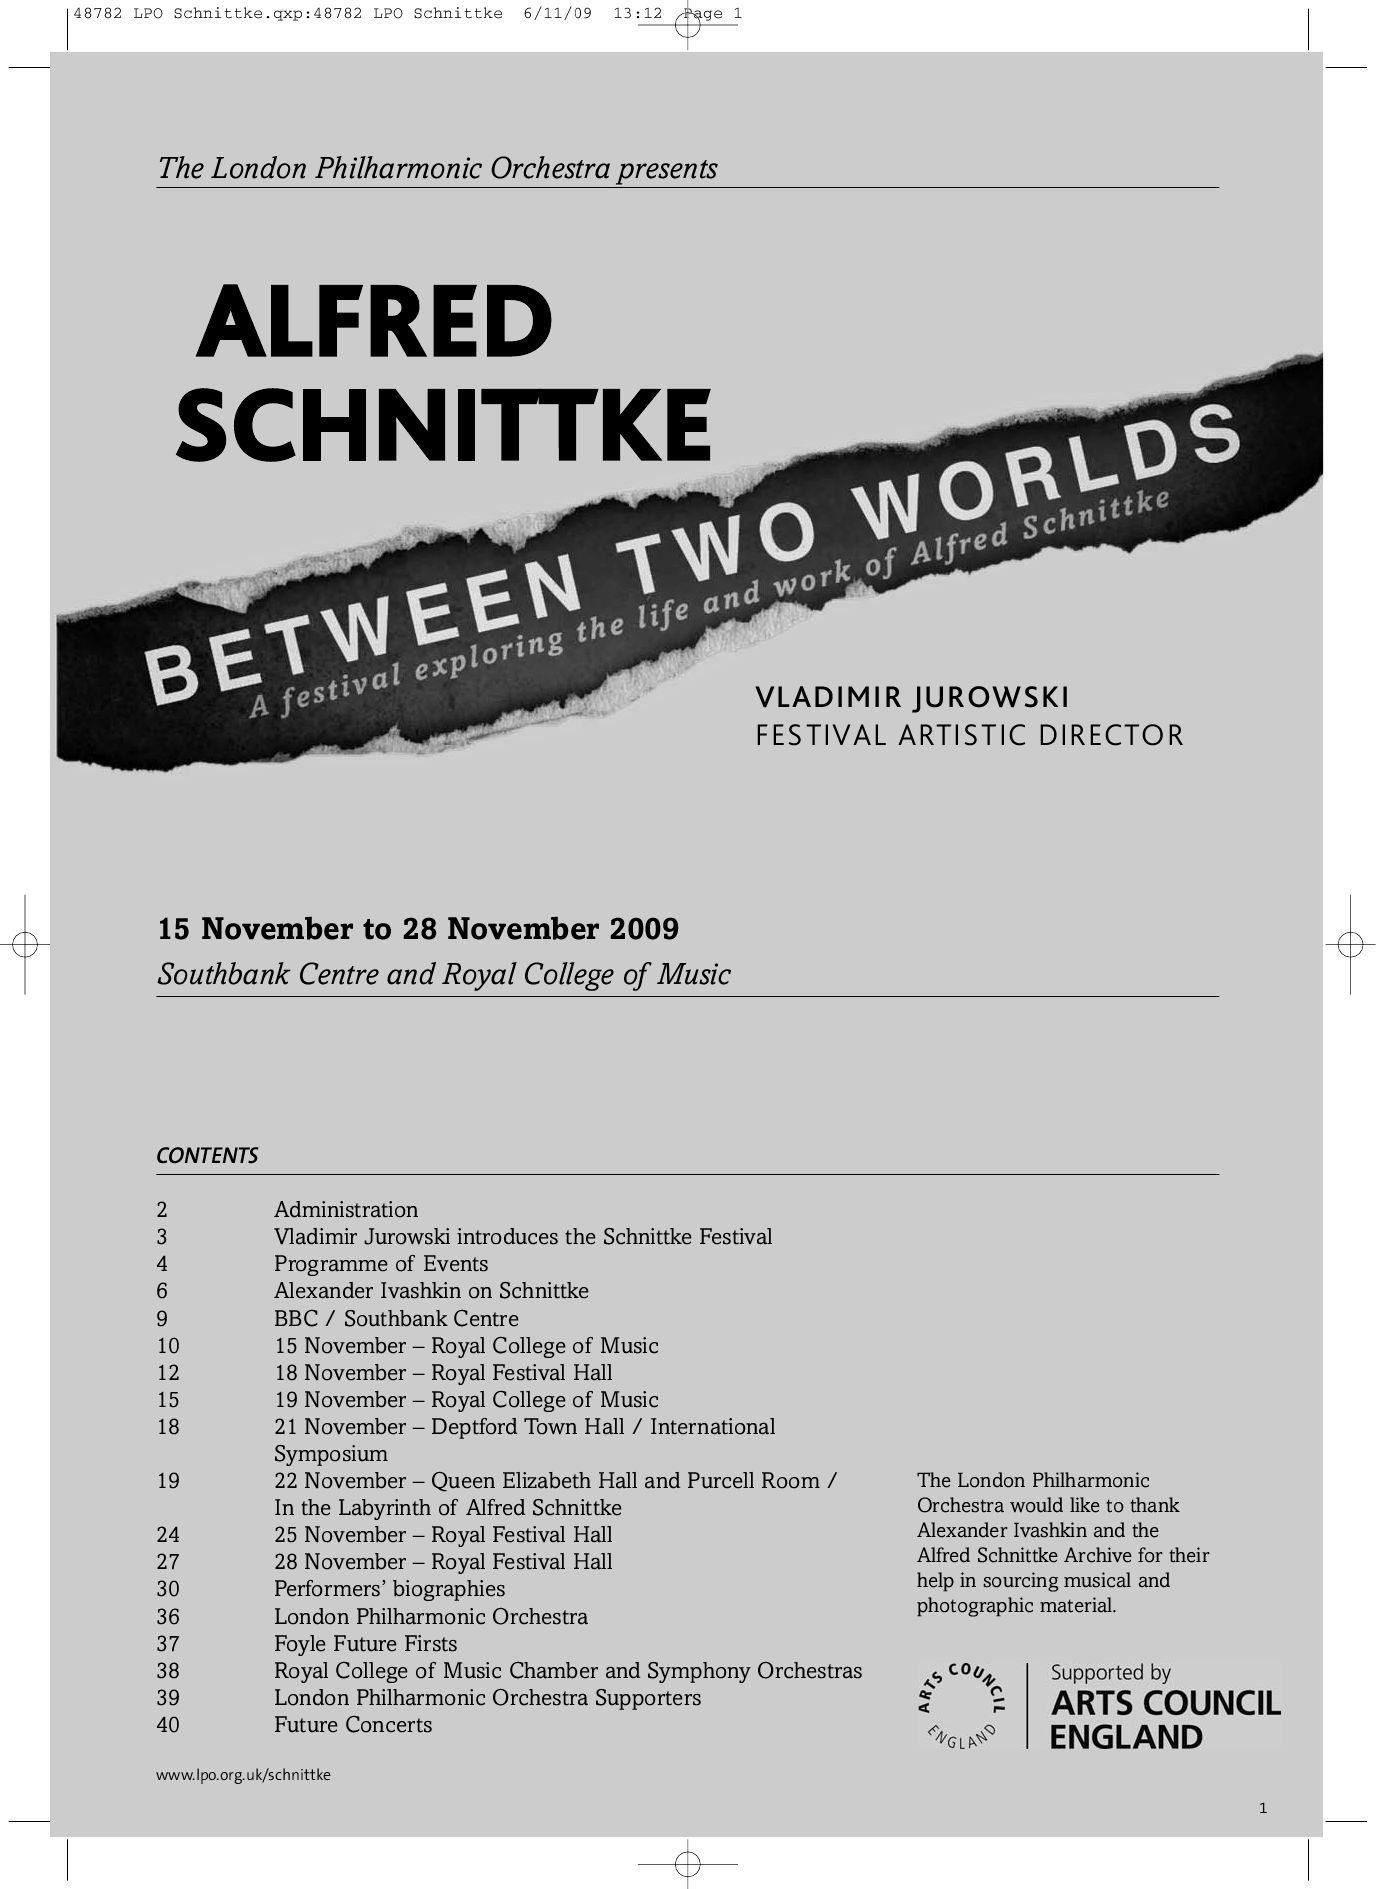 Schnittke programme lpo by london philharmonic orchestra issuu buycottarizona